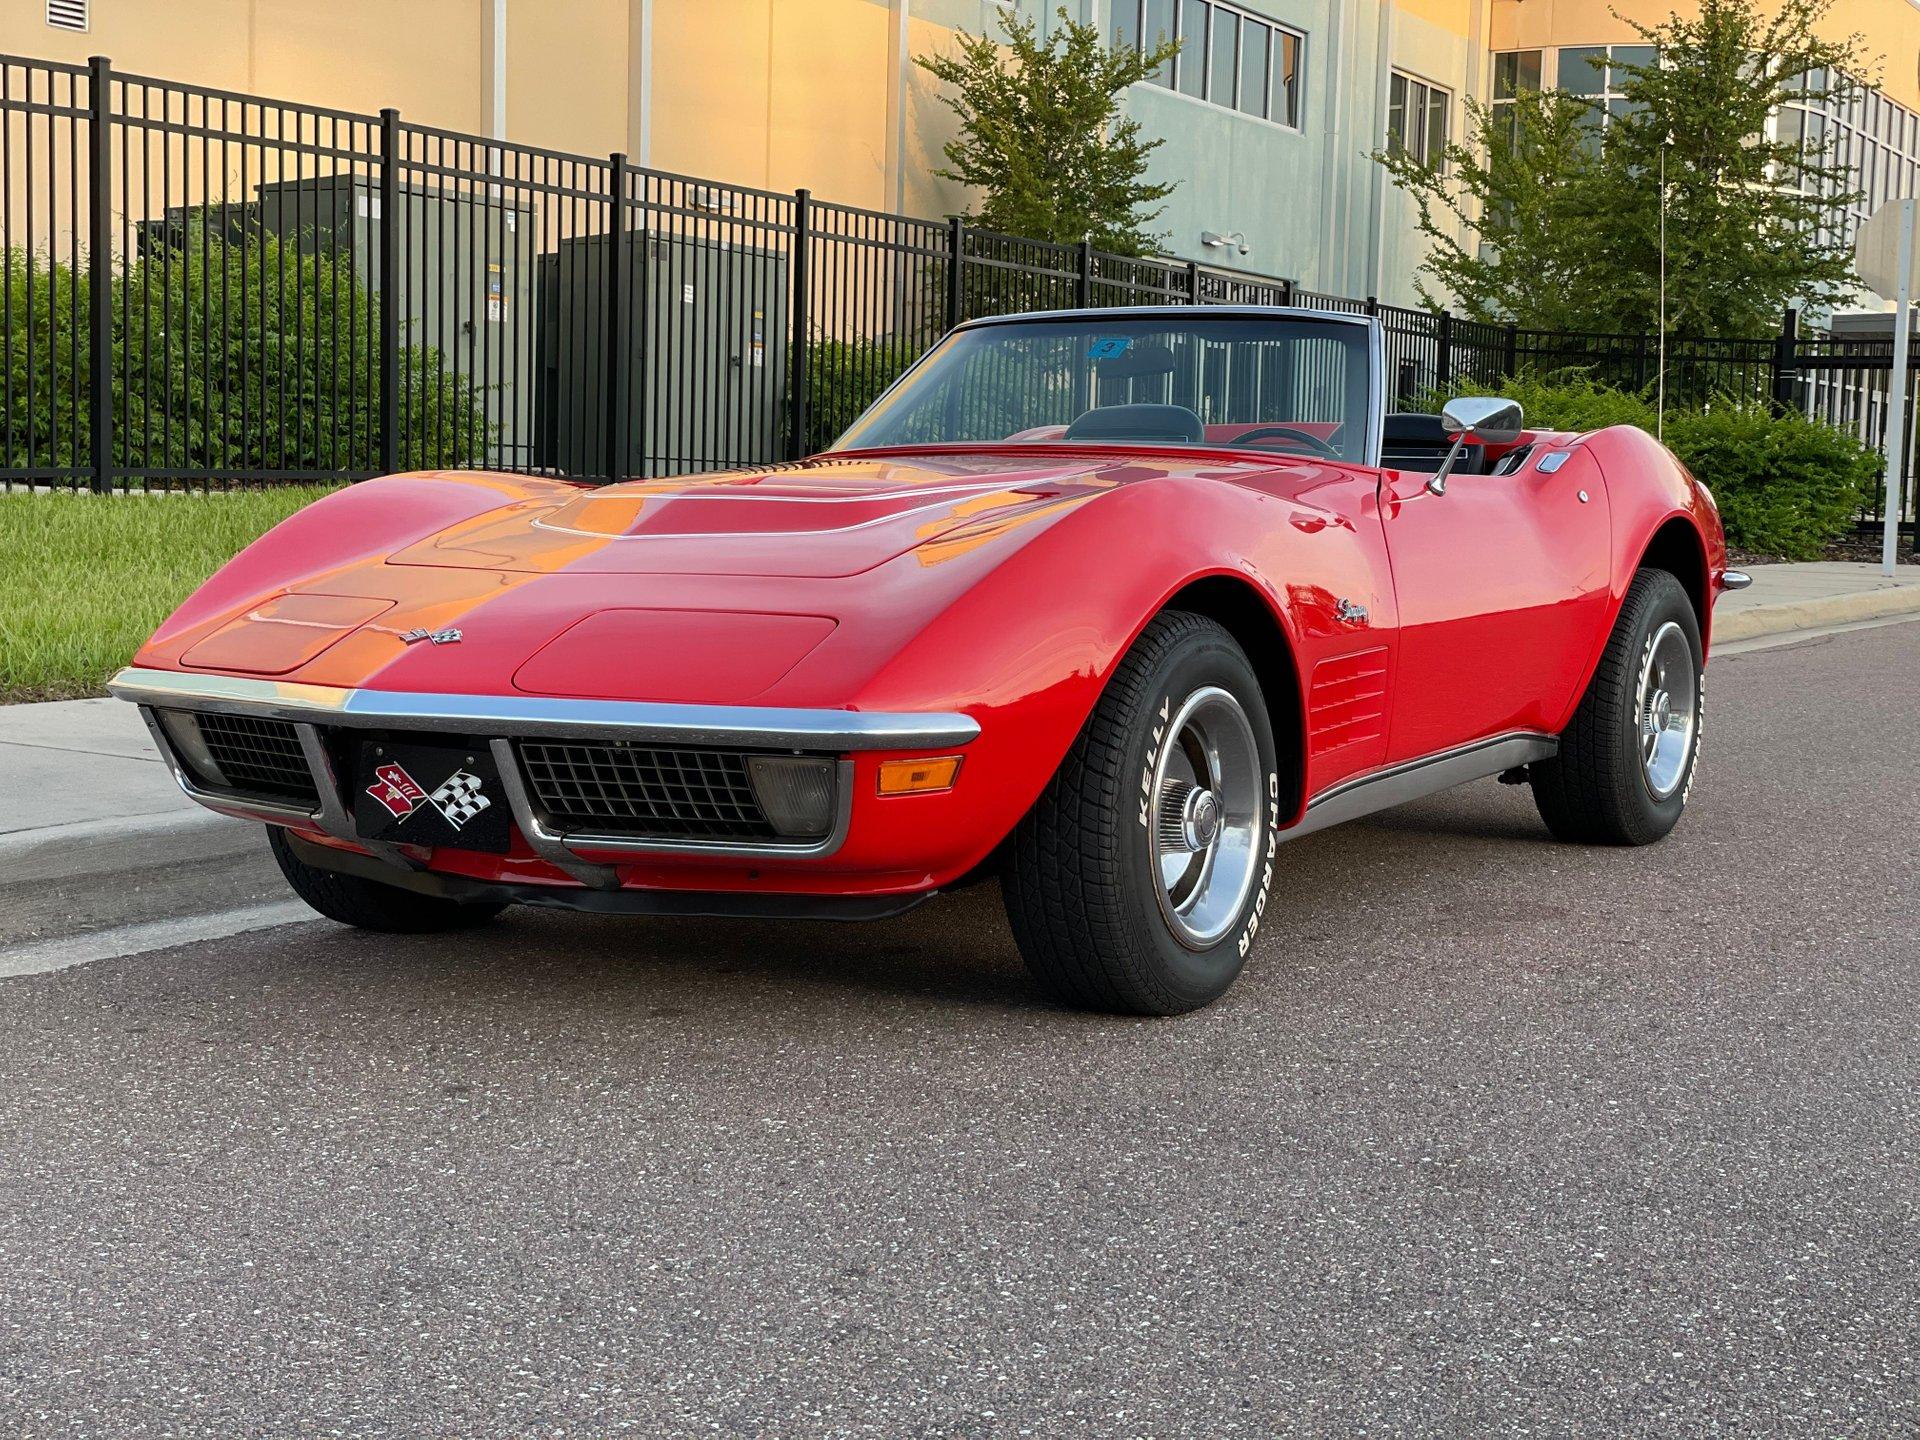 1970 chevrolet corvette lt1 convertible